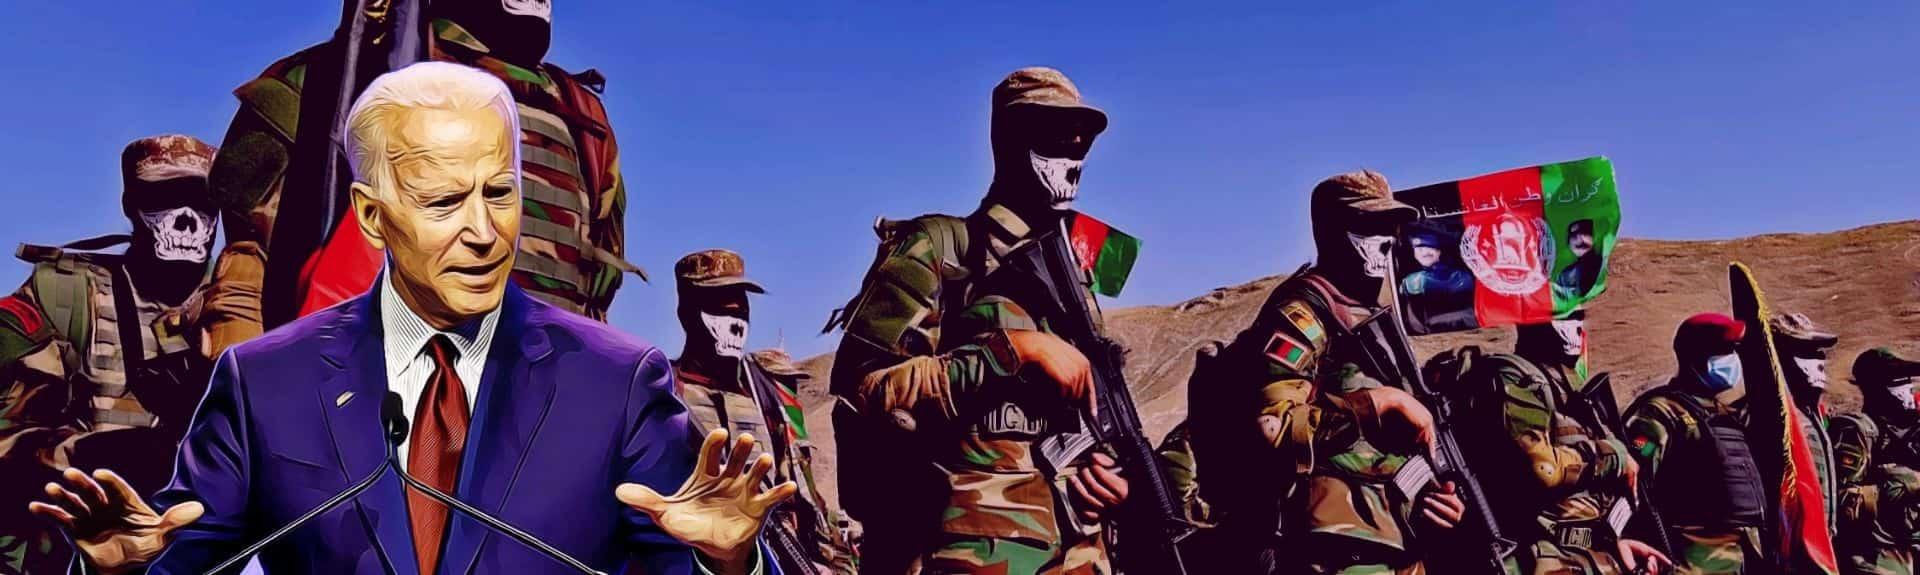 Biden Makes First Public Statement After Taliban Takes Kabul